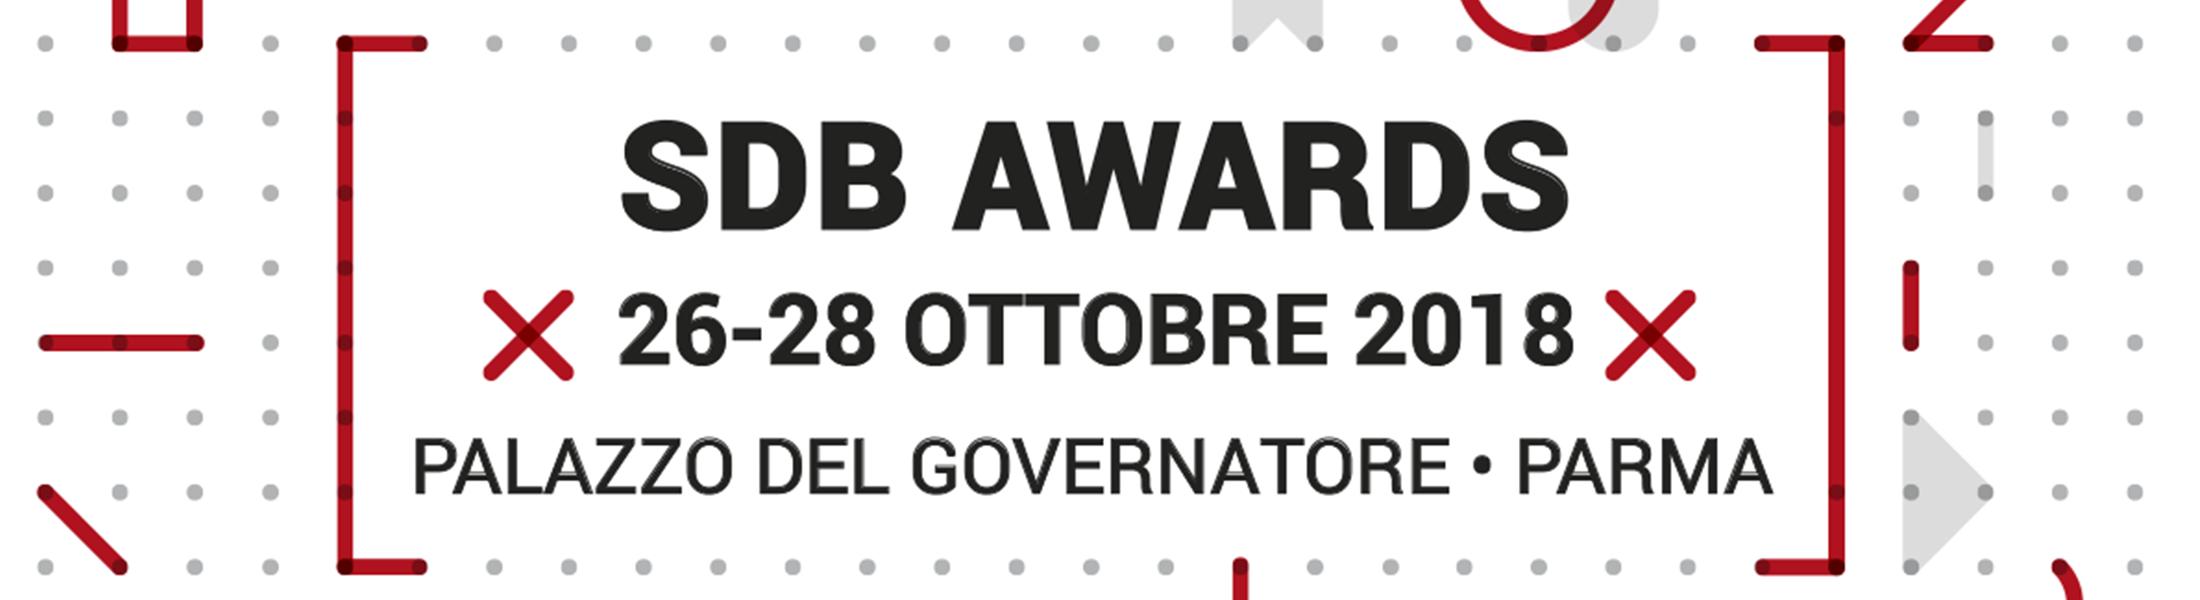 https://awards.sqcuoladiblog.it/wp-content/uploads/2015/12/SDBa18-2200x600.png